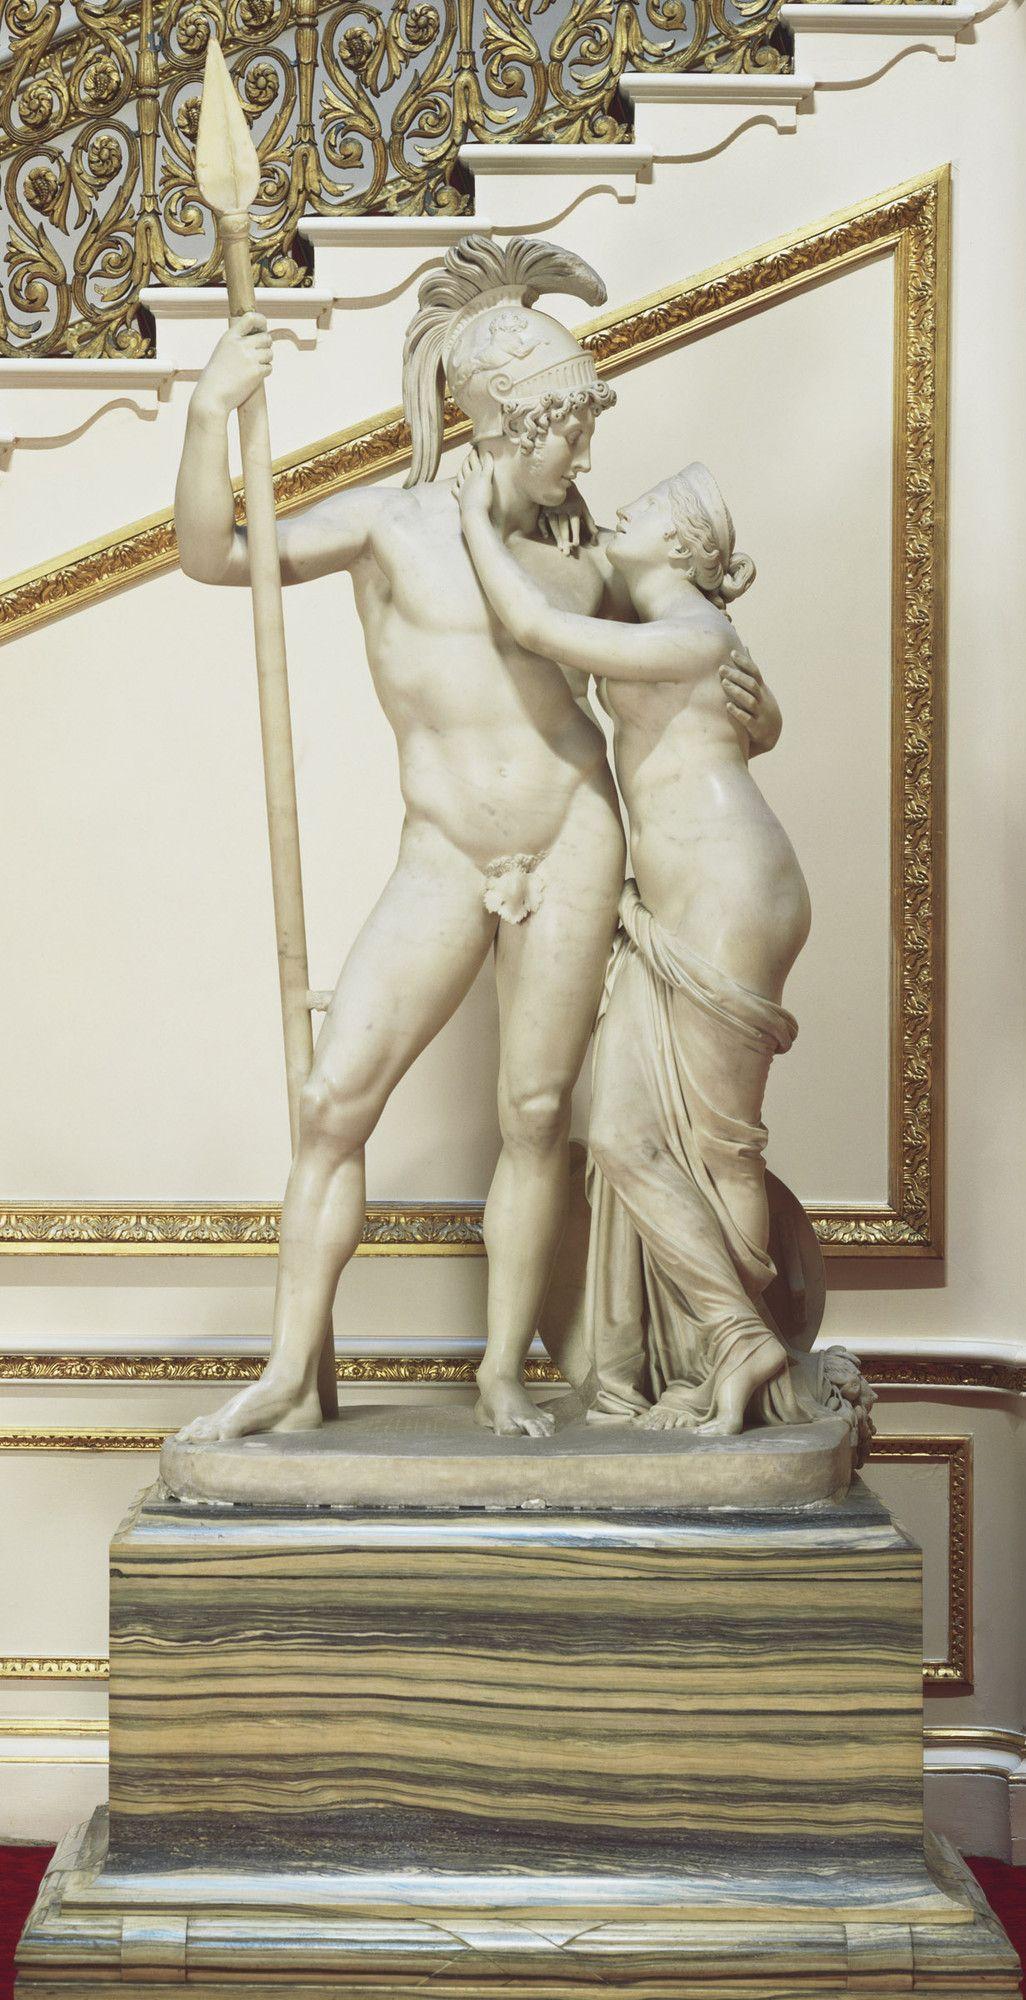 c.1822 Antonio Canova Mars and Venus | The Royal Collection